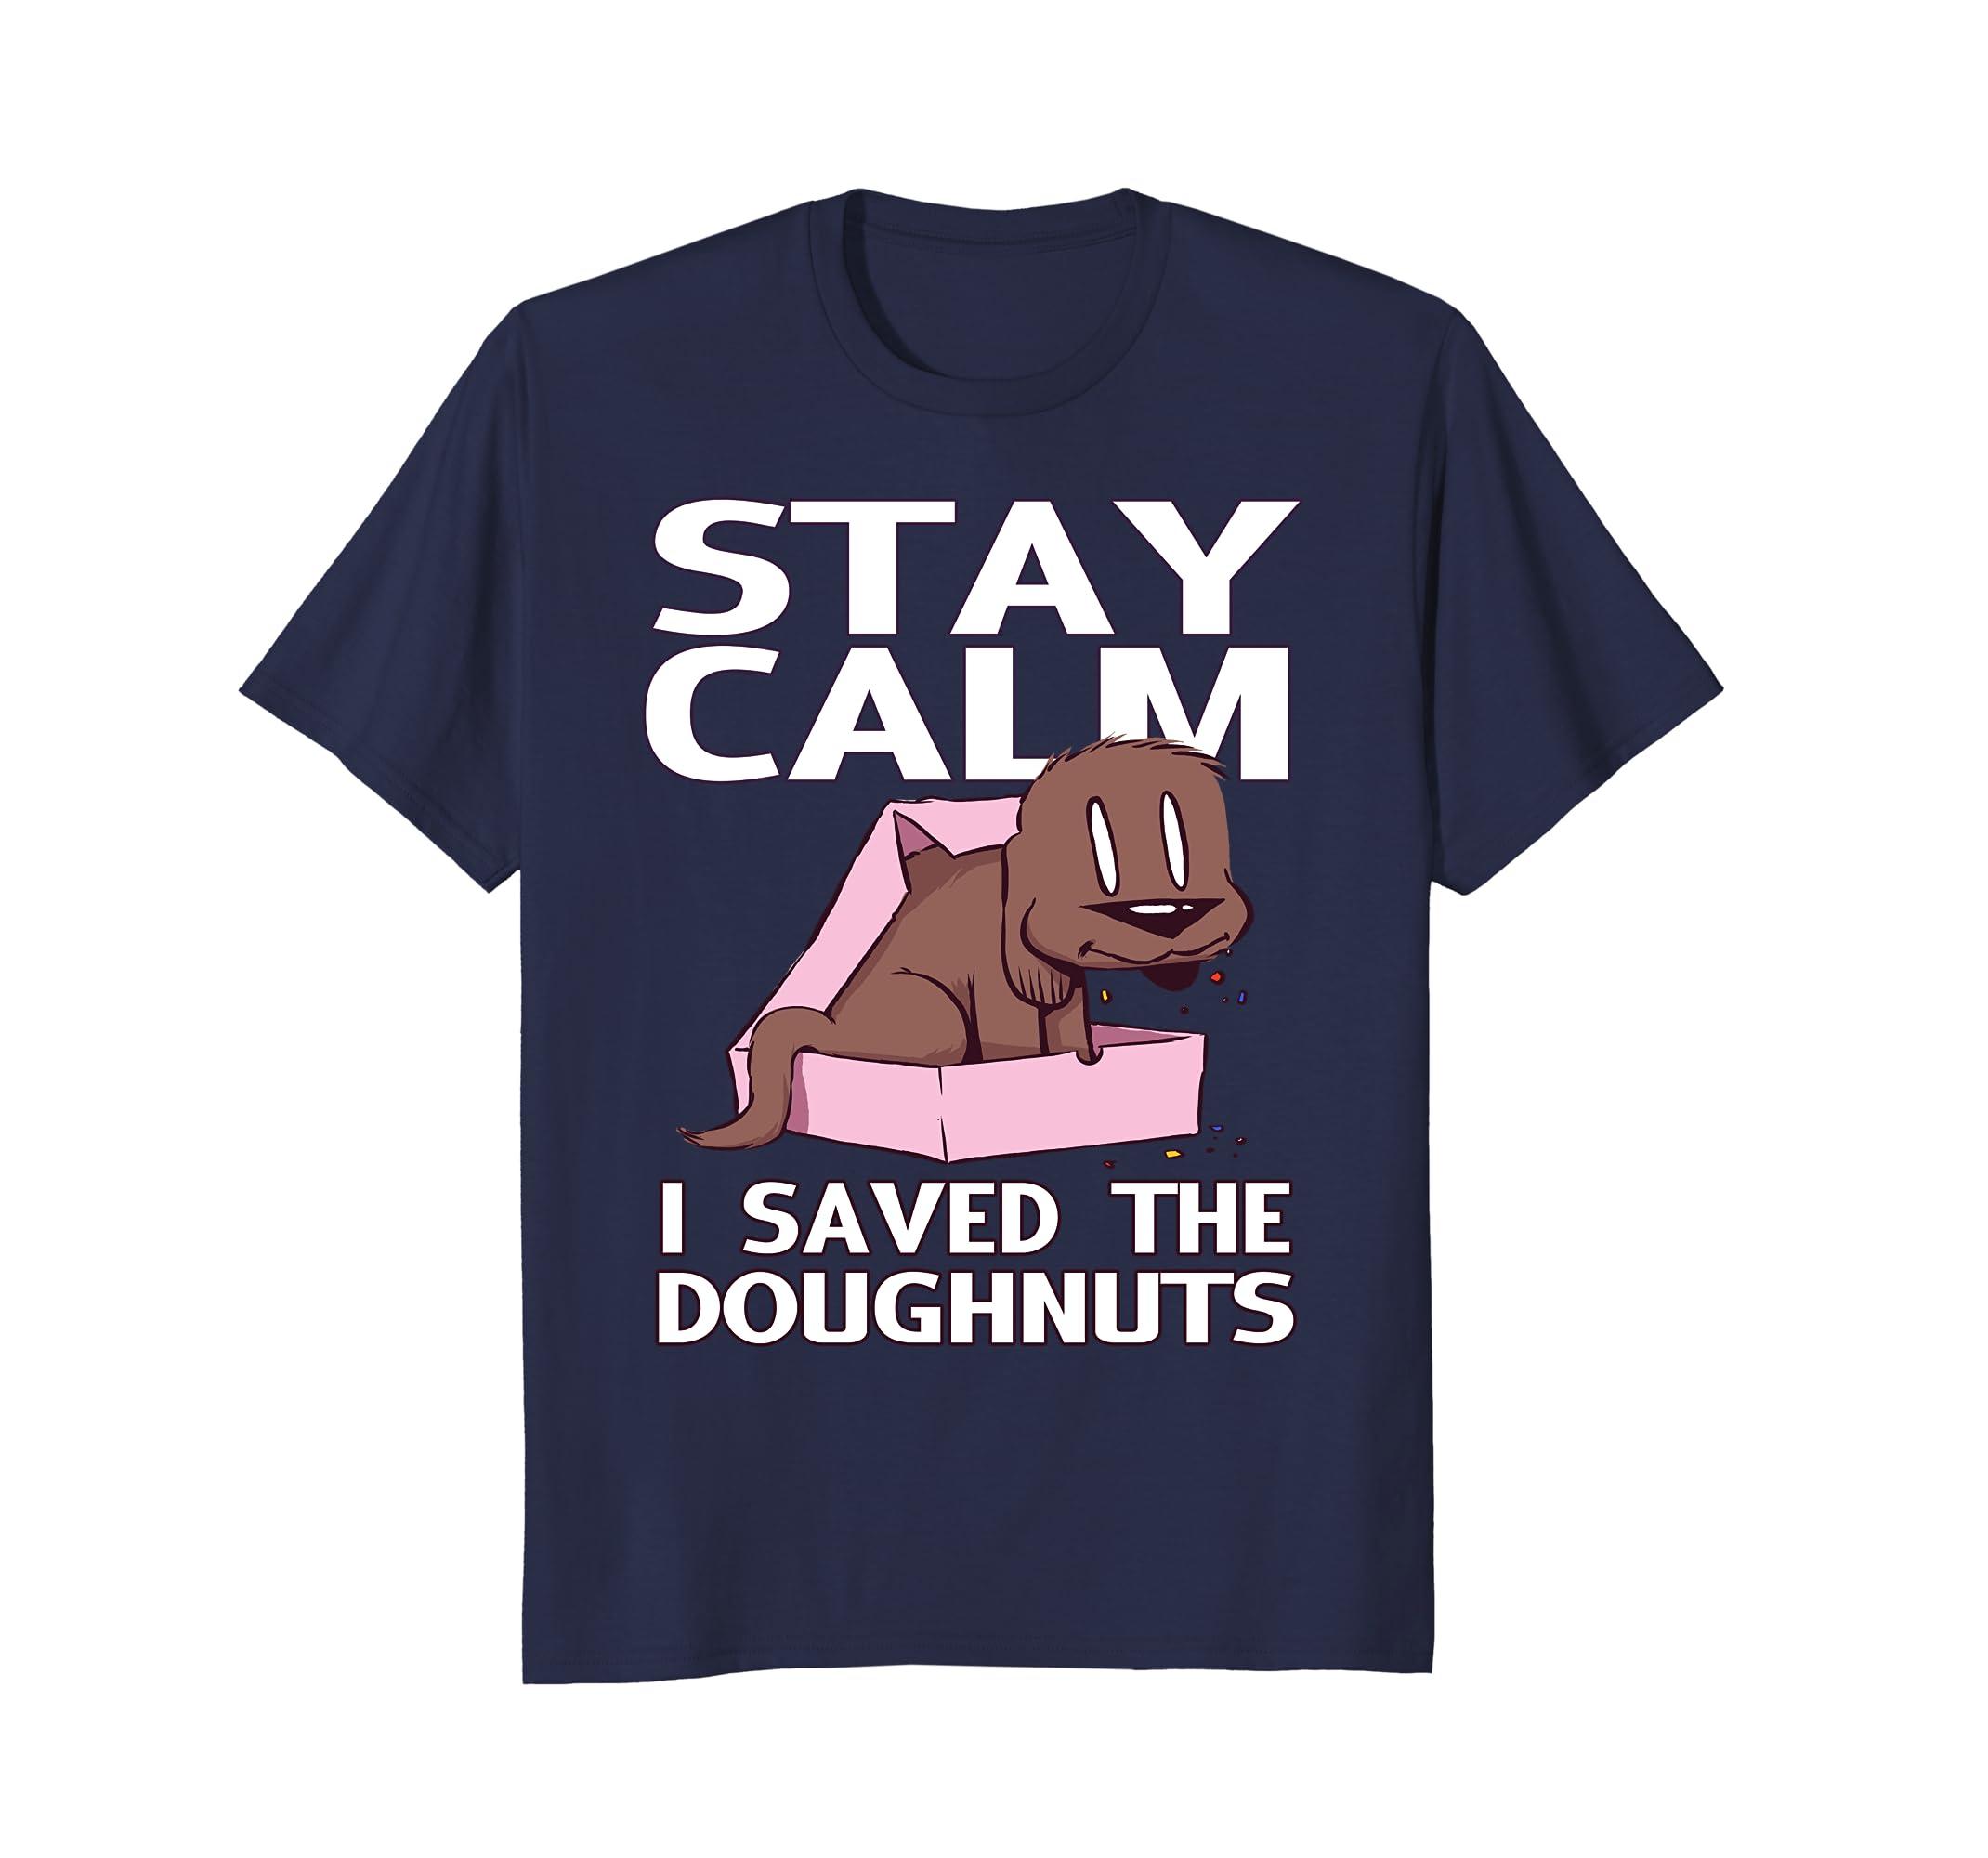 Dog eat Doug - Stay calm I saved the doughnuts-AZP